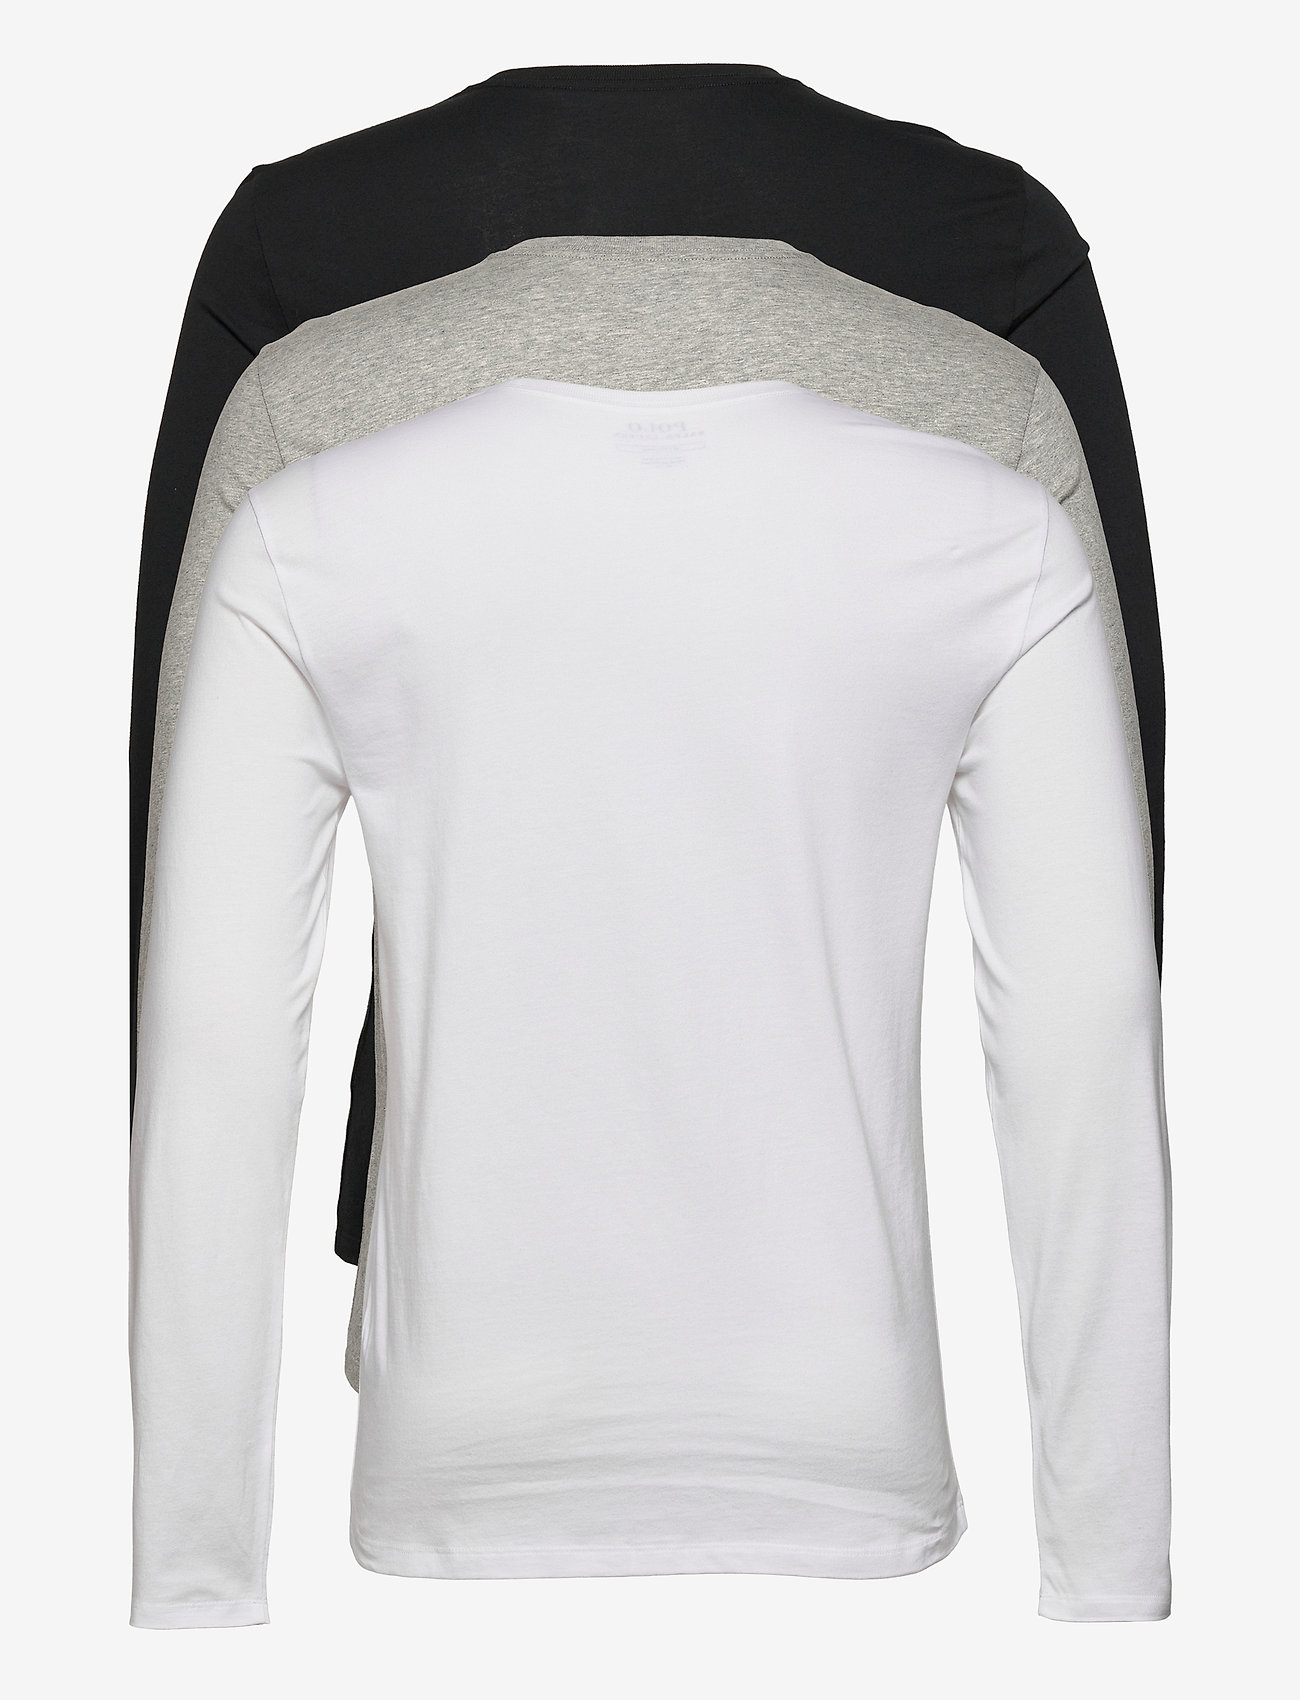 Polo Ralph Lauren Underwear - 0 - basic t-shirts - 3pk white/black/a - 1